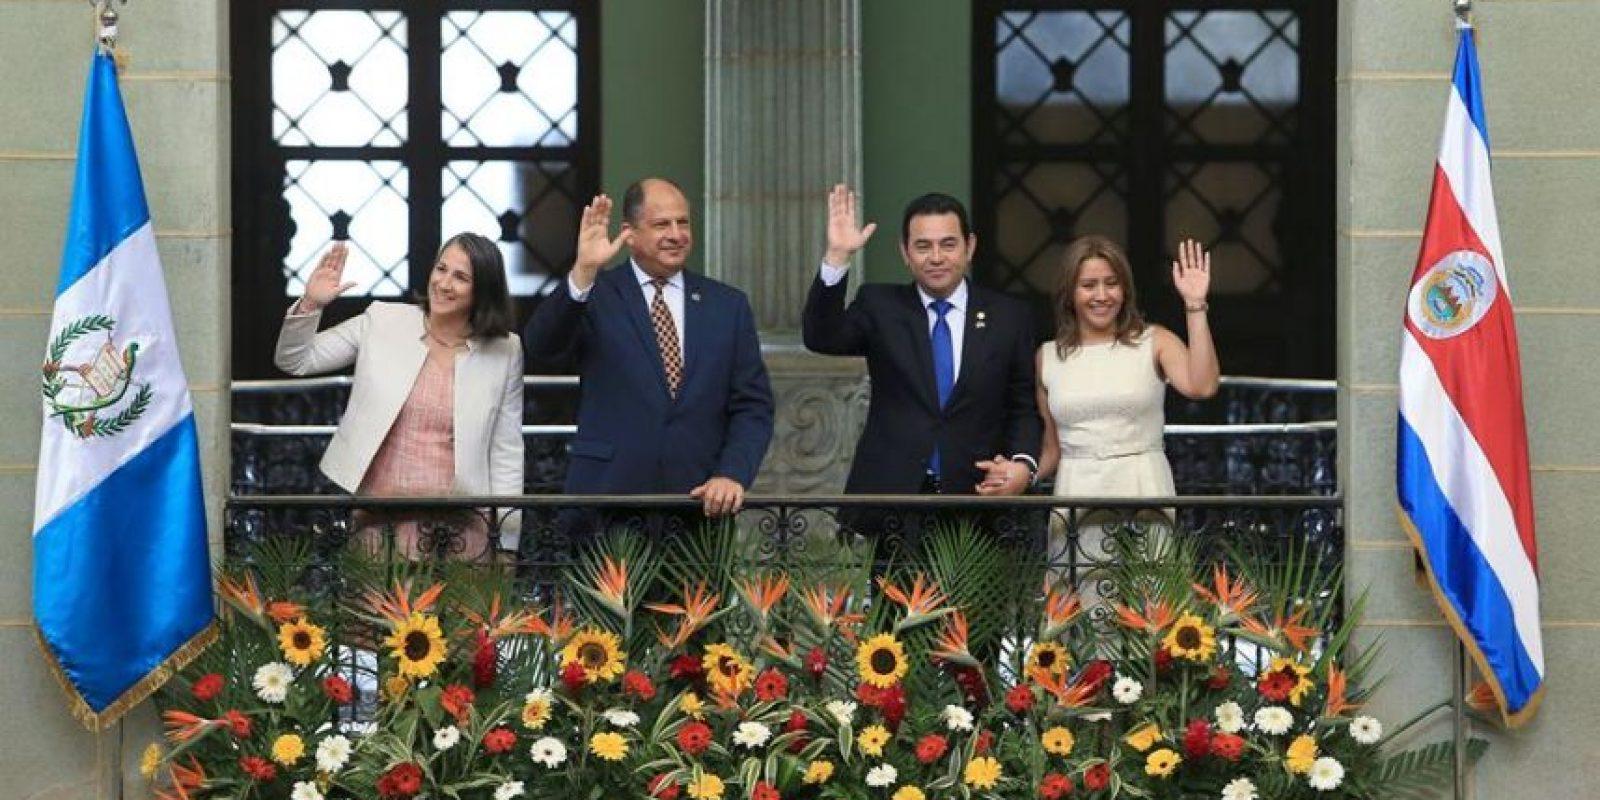 Foto:Facebook/Primera dama